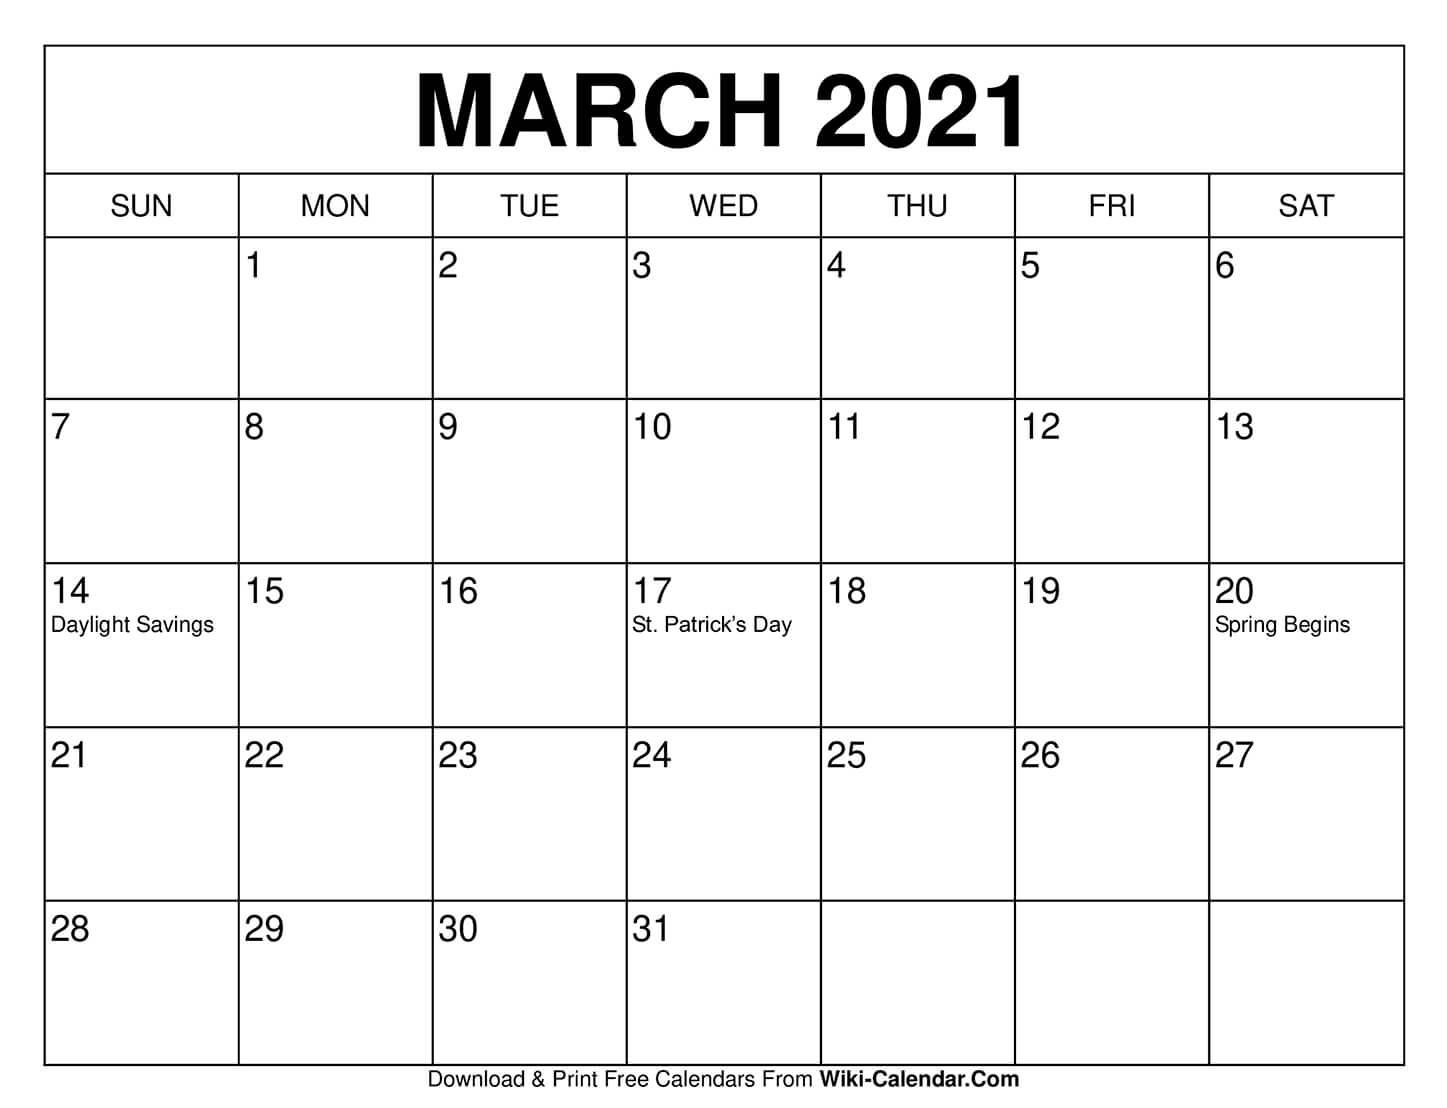 March 2021 Printable Calendar 8X10